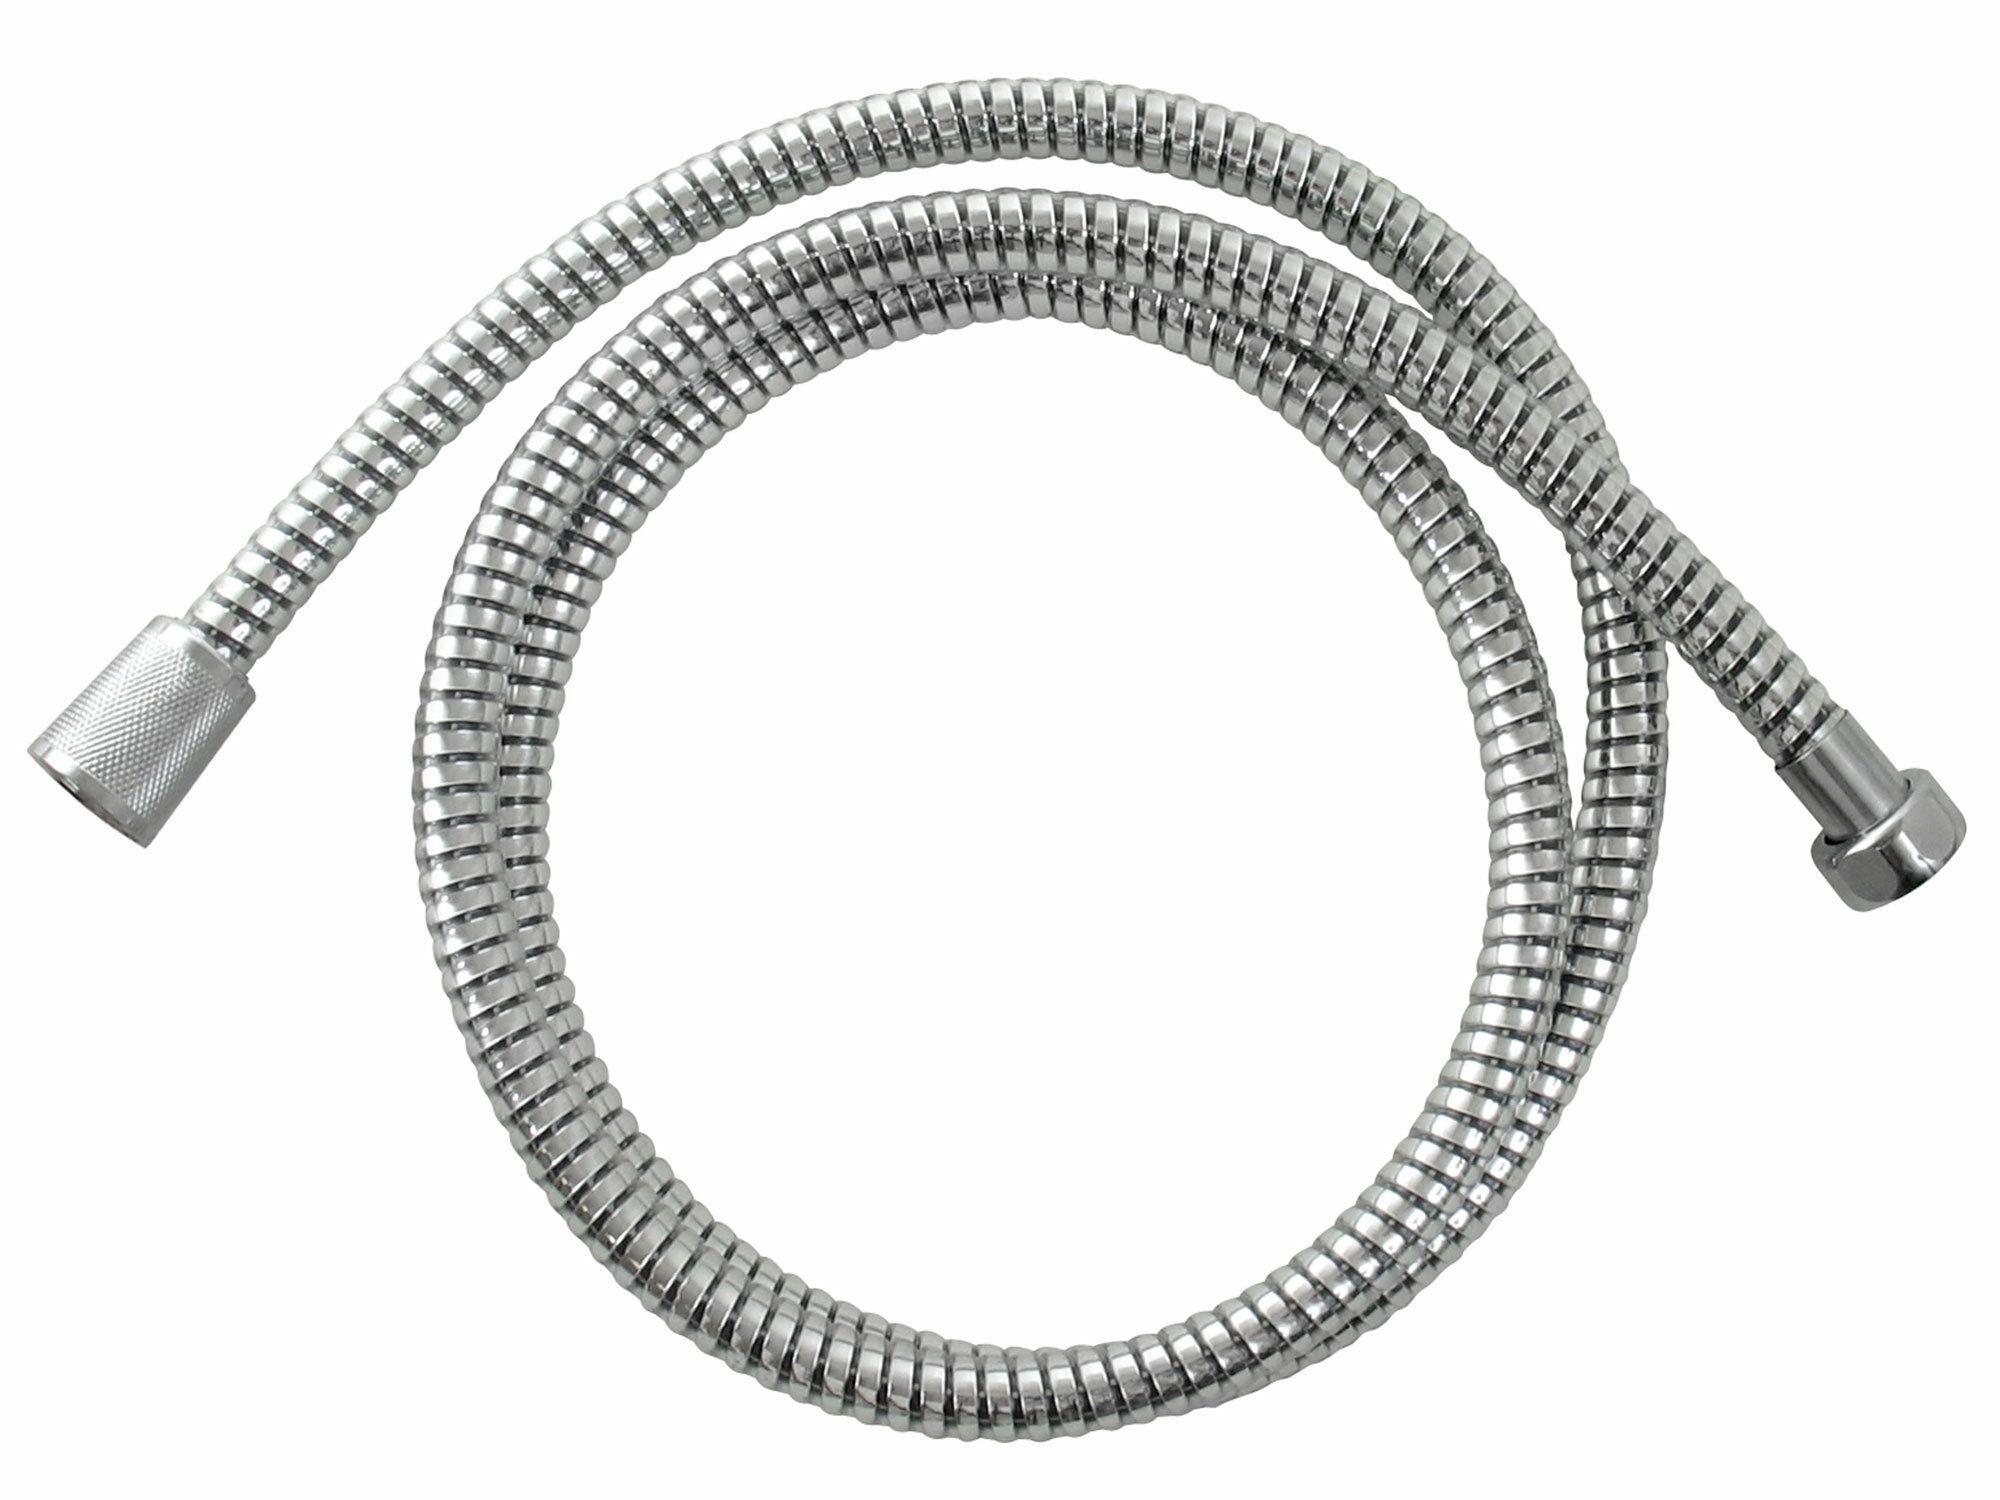 Hadice sprchová, stříbrná, 150cm, PVC, BALLETTO